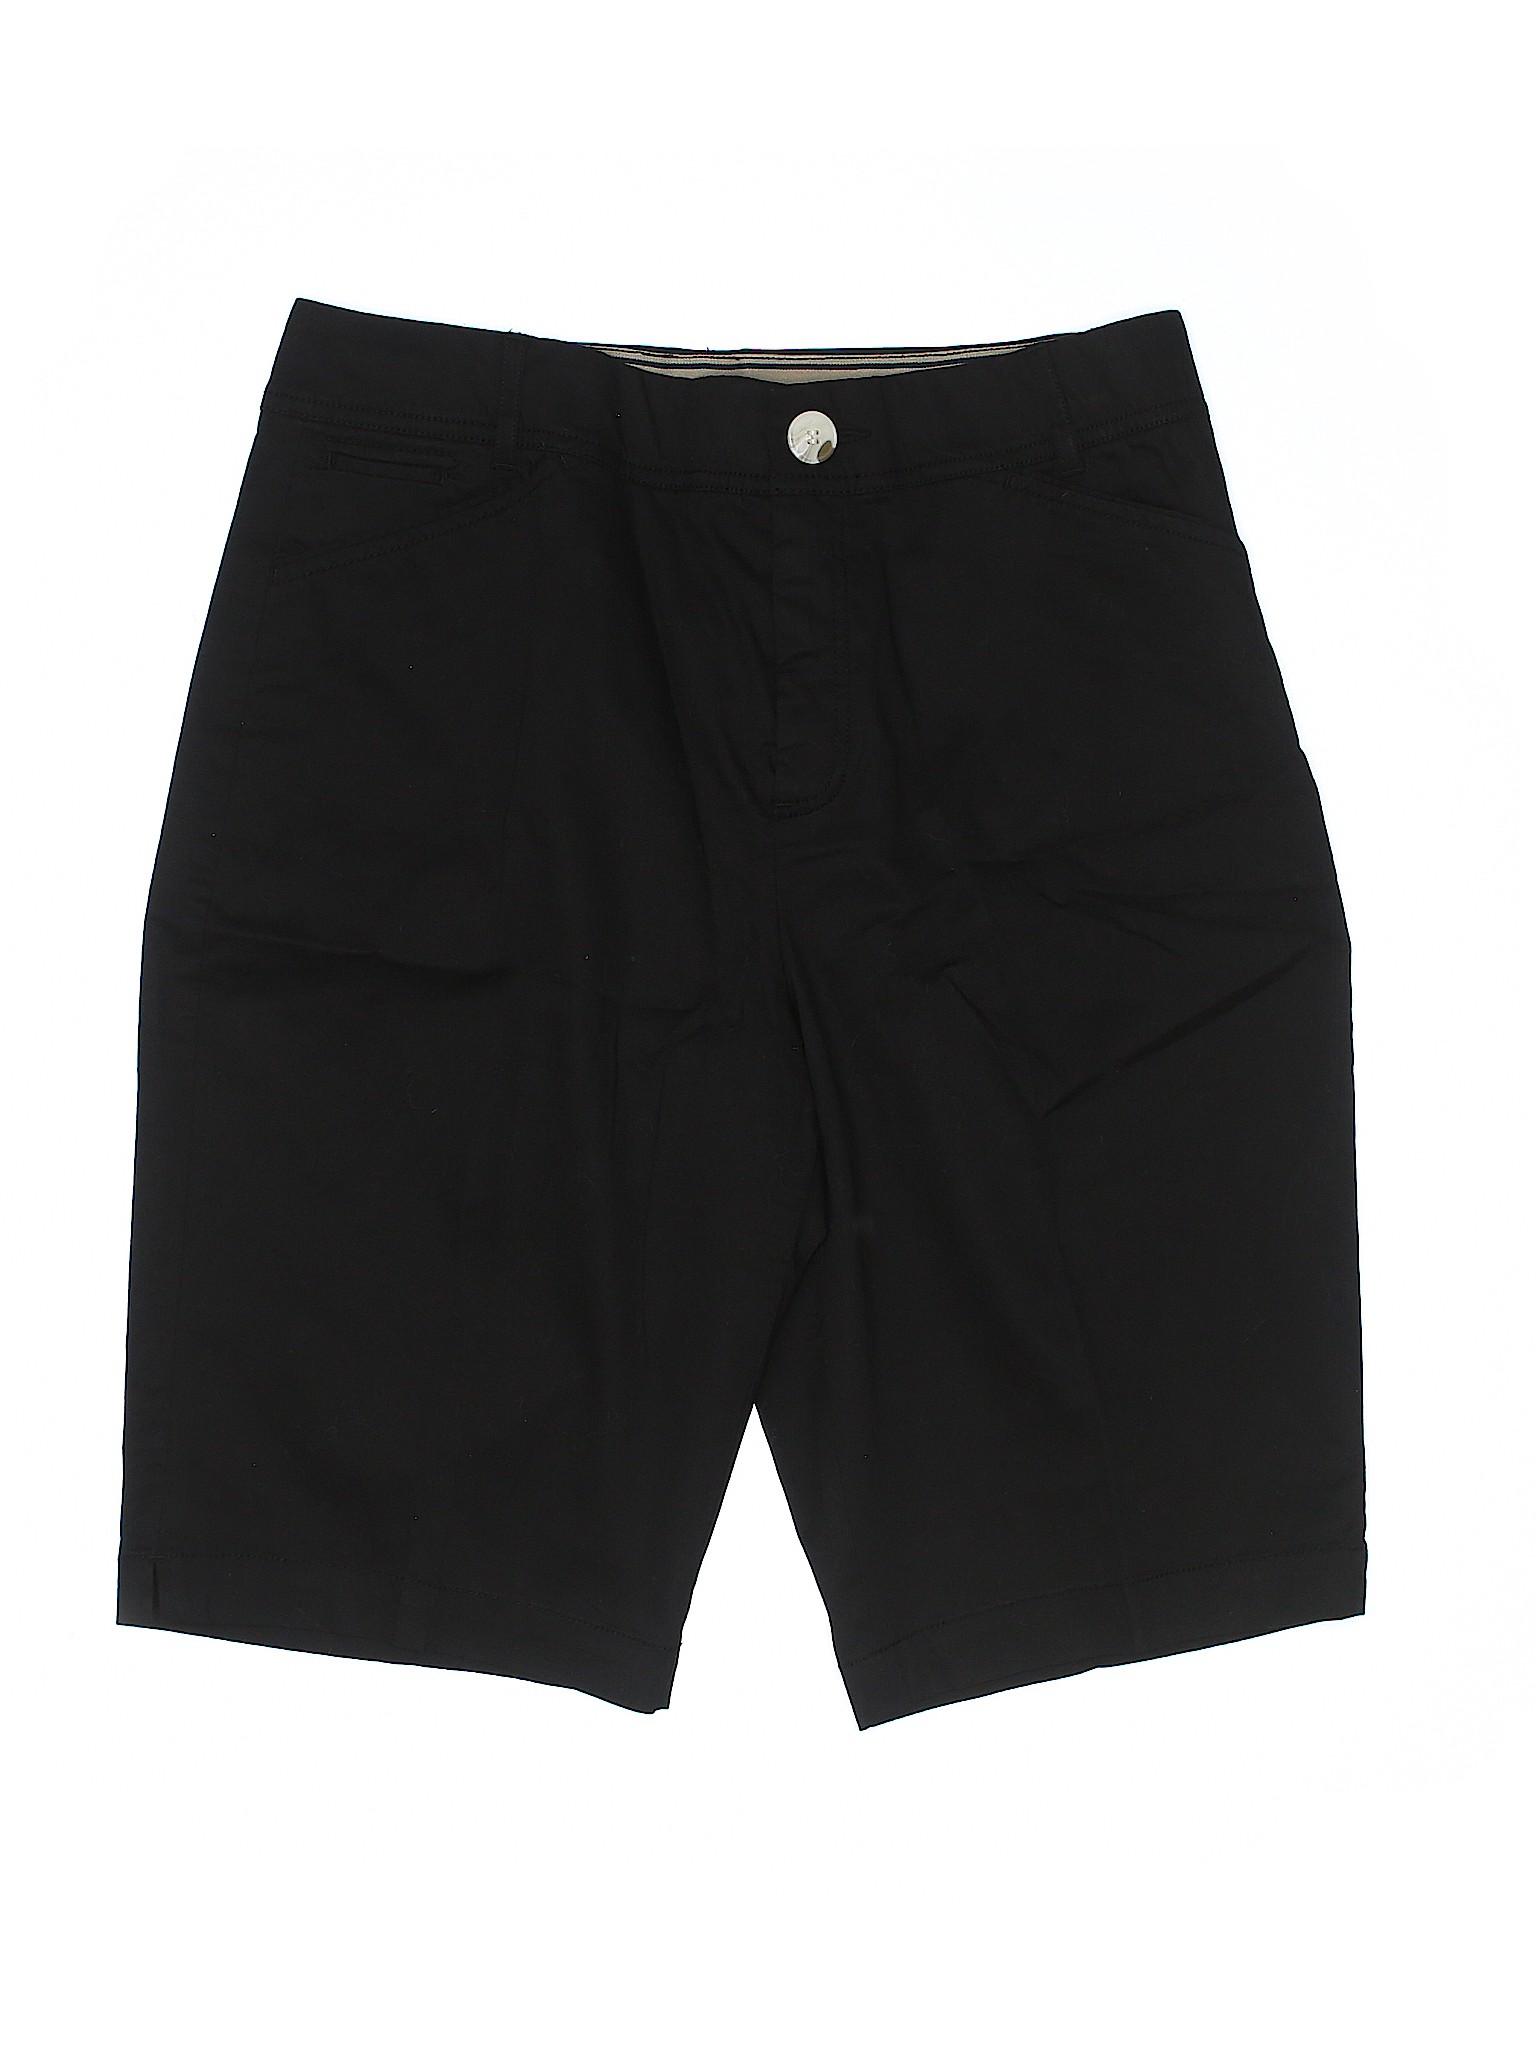 Shorts Khaki Boutique Christopher Banks amp; aw0IX